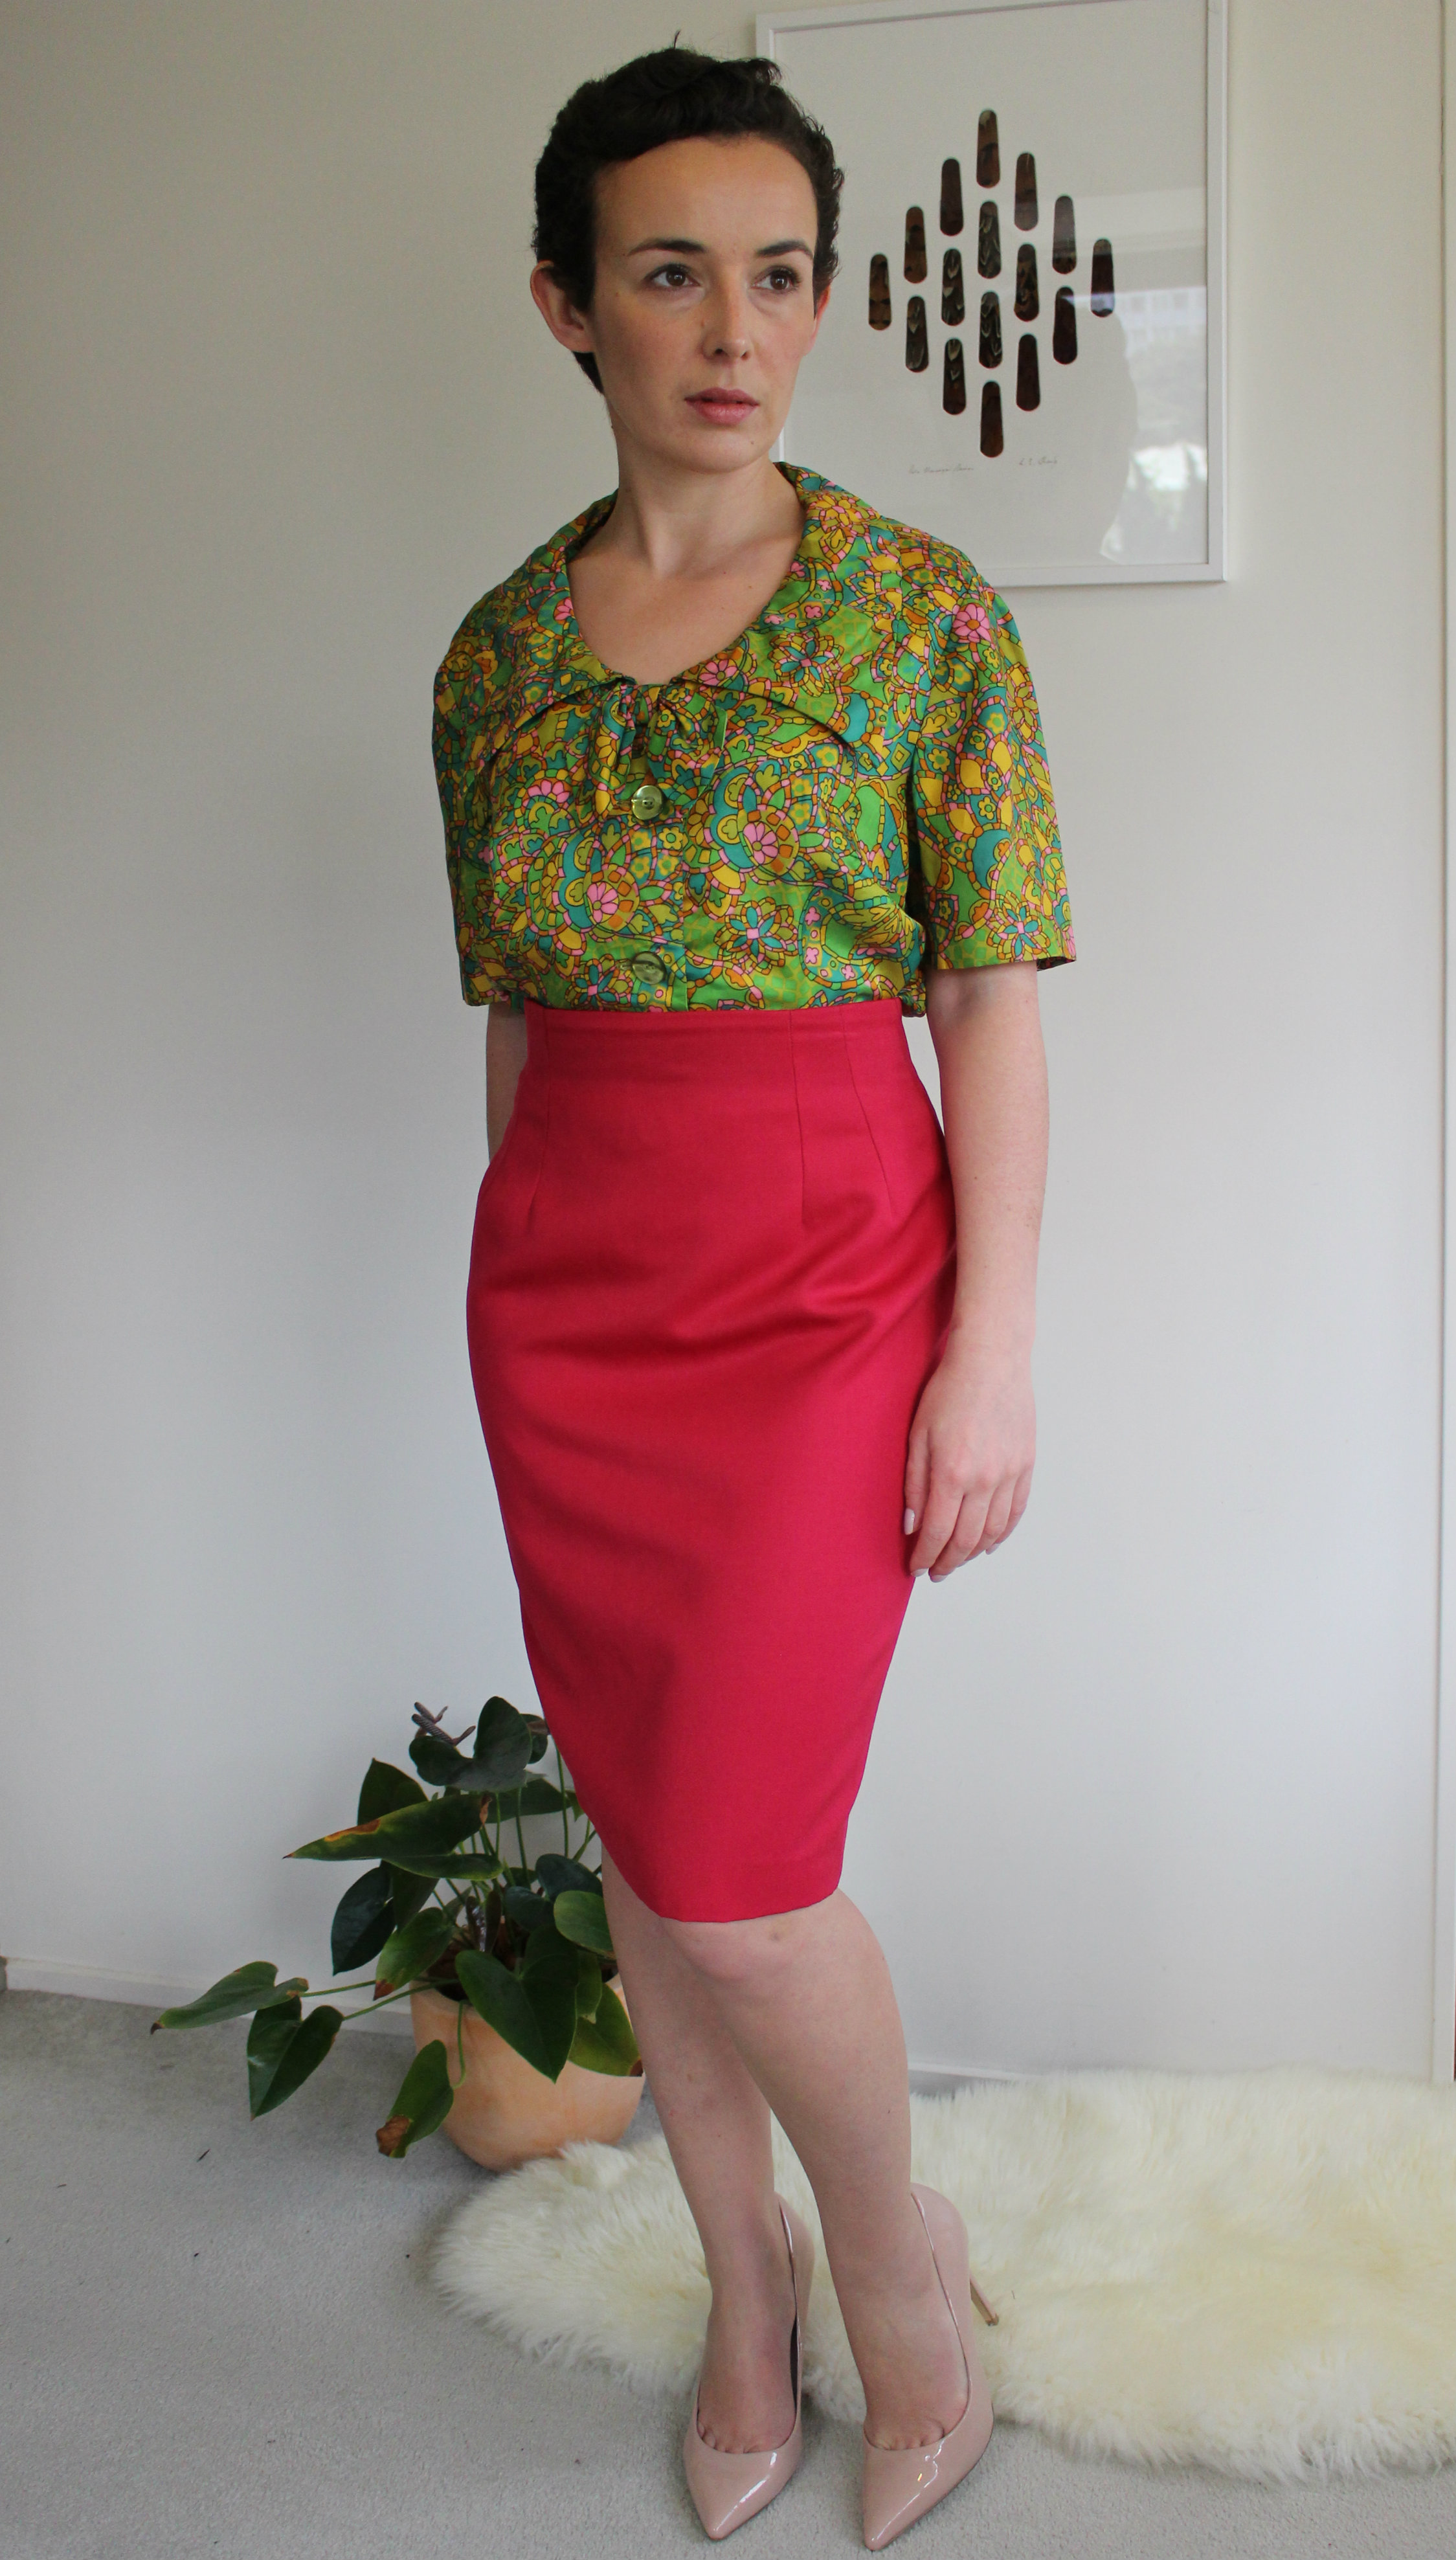 Skirt: Gilles Dewavrin via SaveMart; Blouse: Lorna Cooper for Selby via Thrift